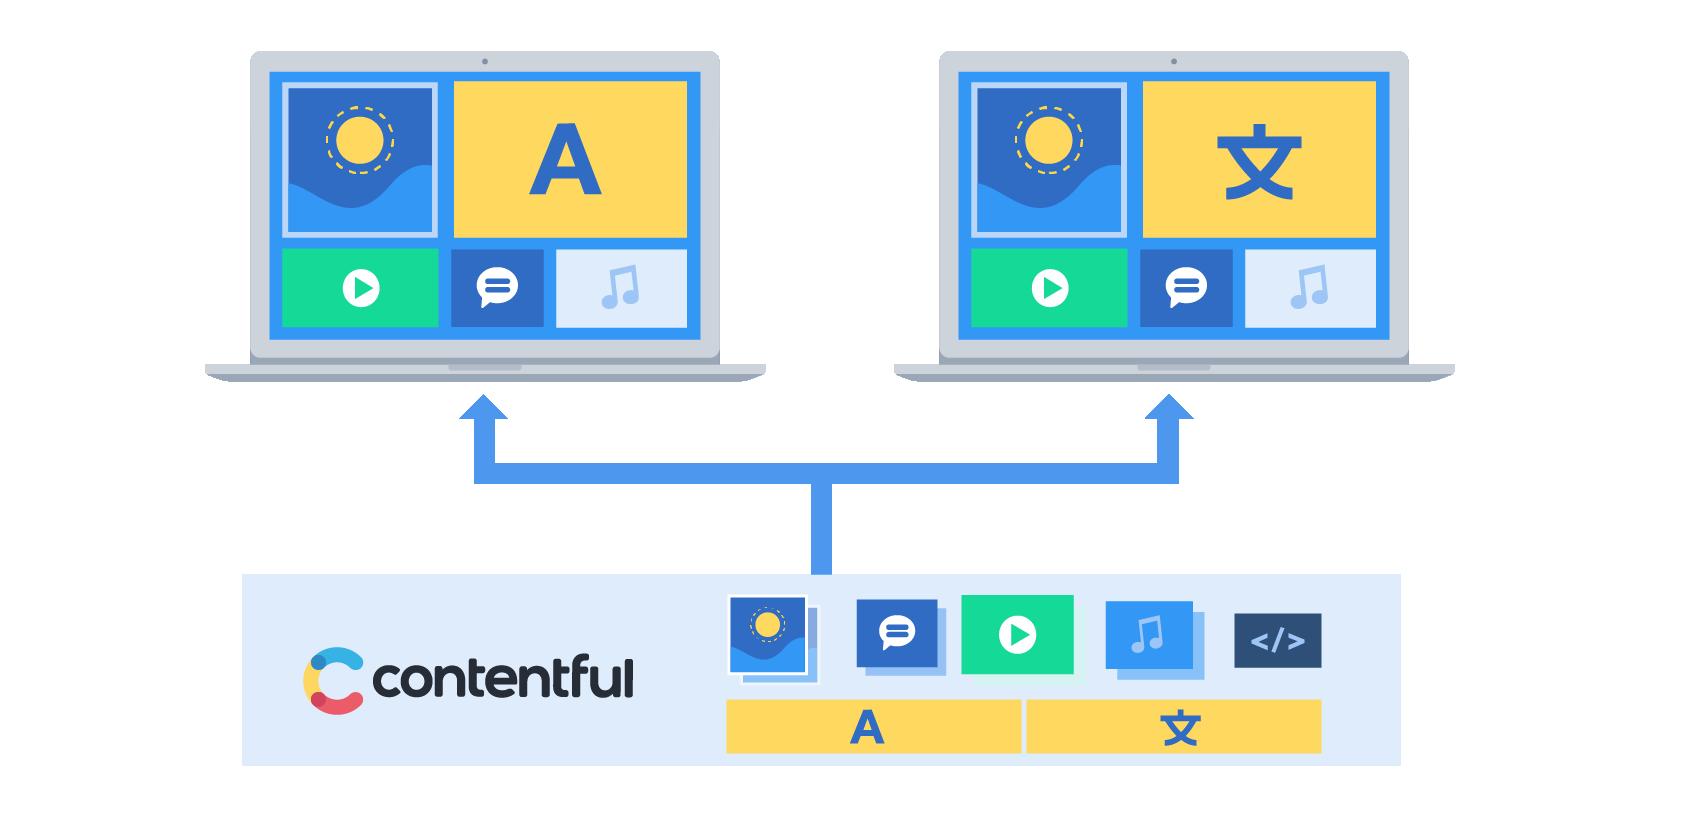 Digital transformation diagram